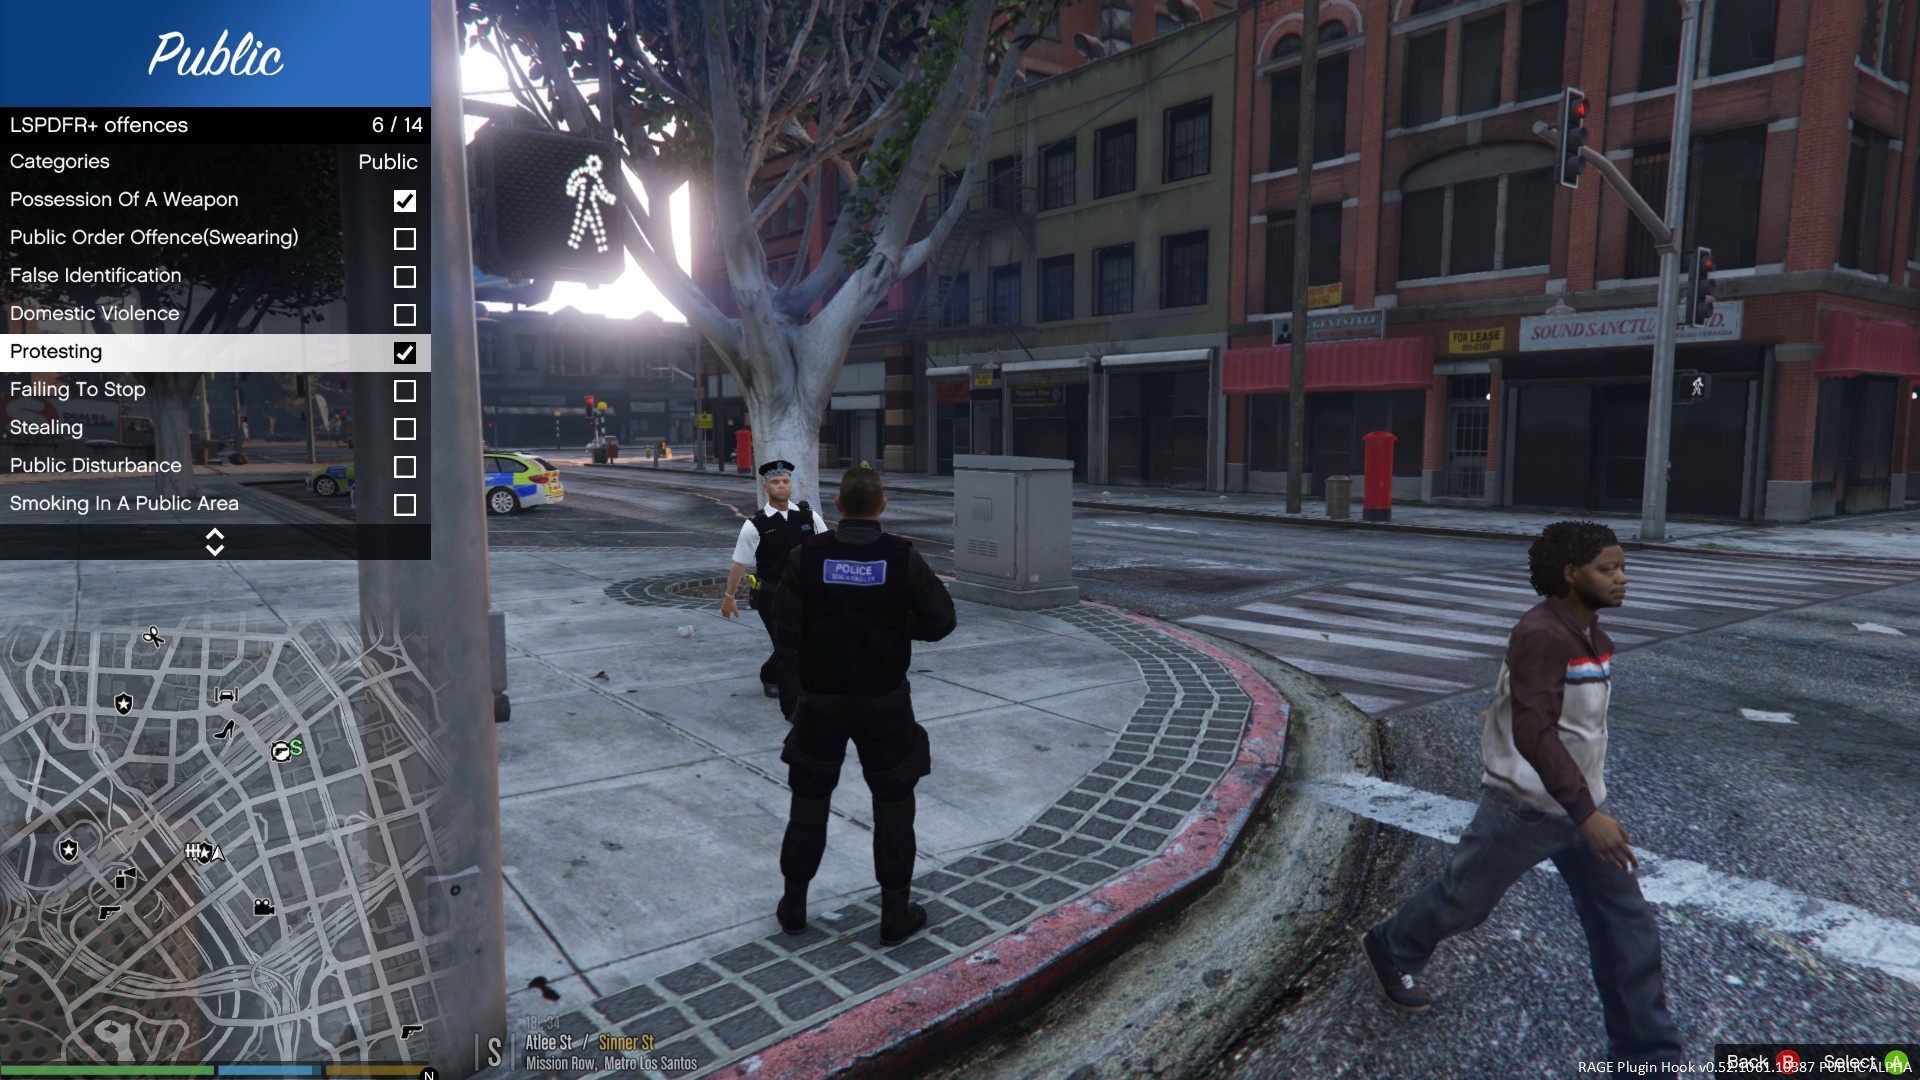 LSPDFR+ British Public Offenses - GTA5-Mods com